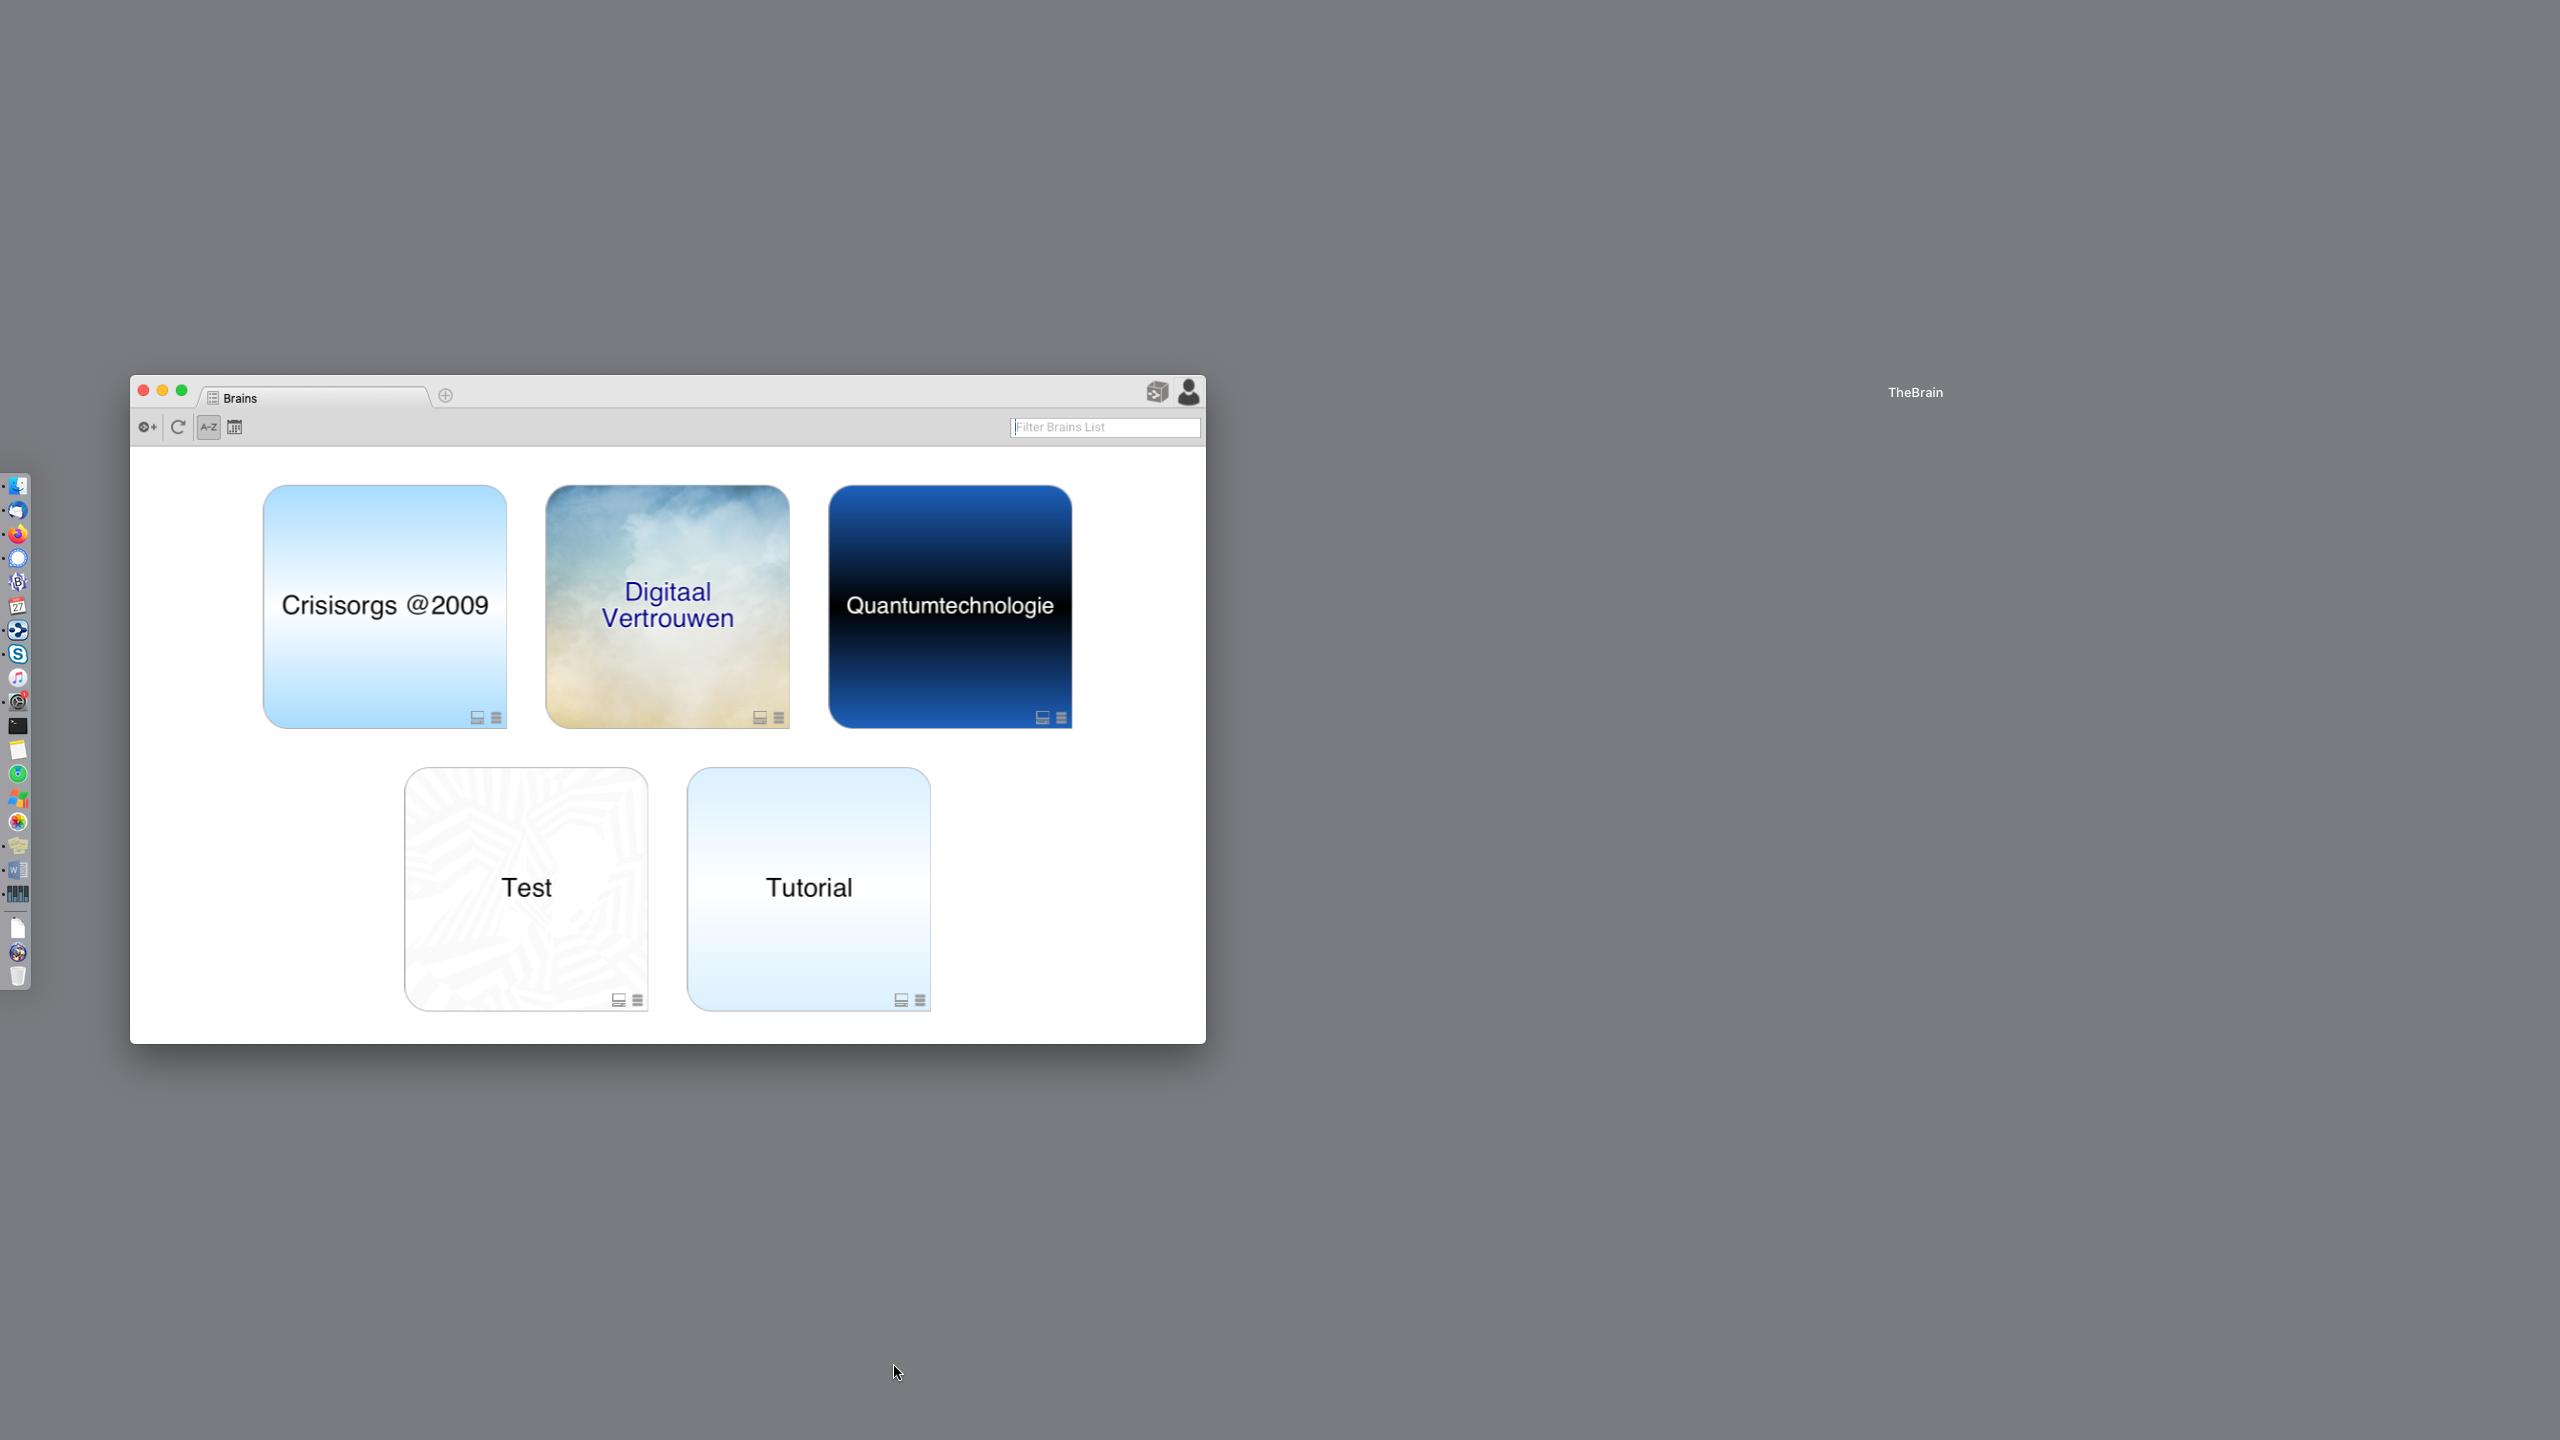 Click image for larger version - Name: Screenshot 2020-05-27 at 07.54.54.png, Views: 12, Size: 388.01 KB